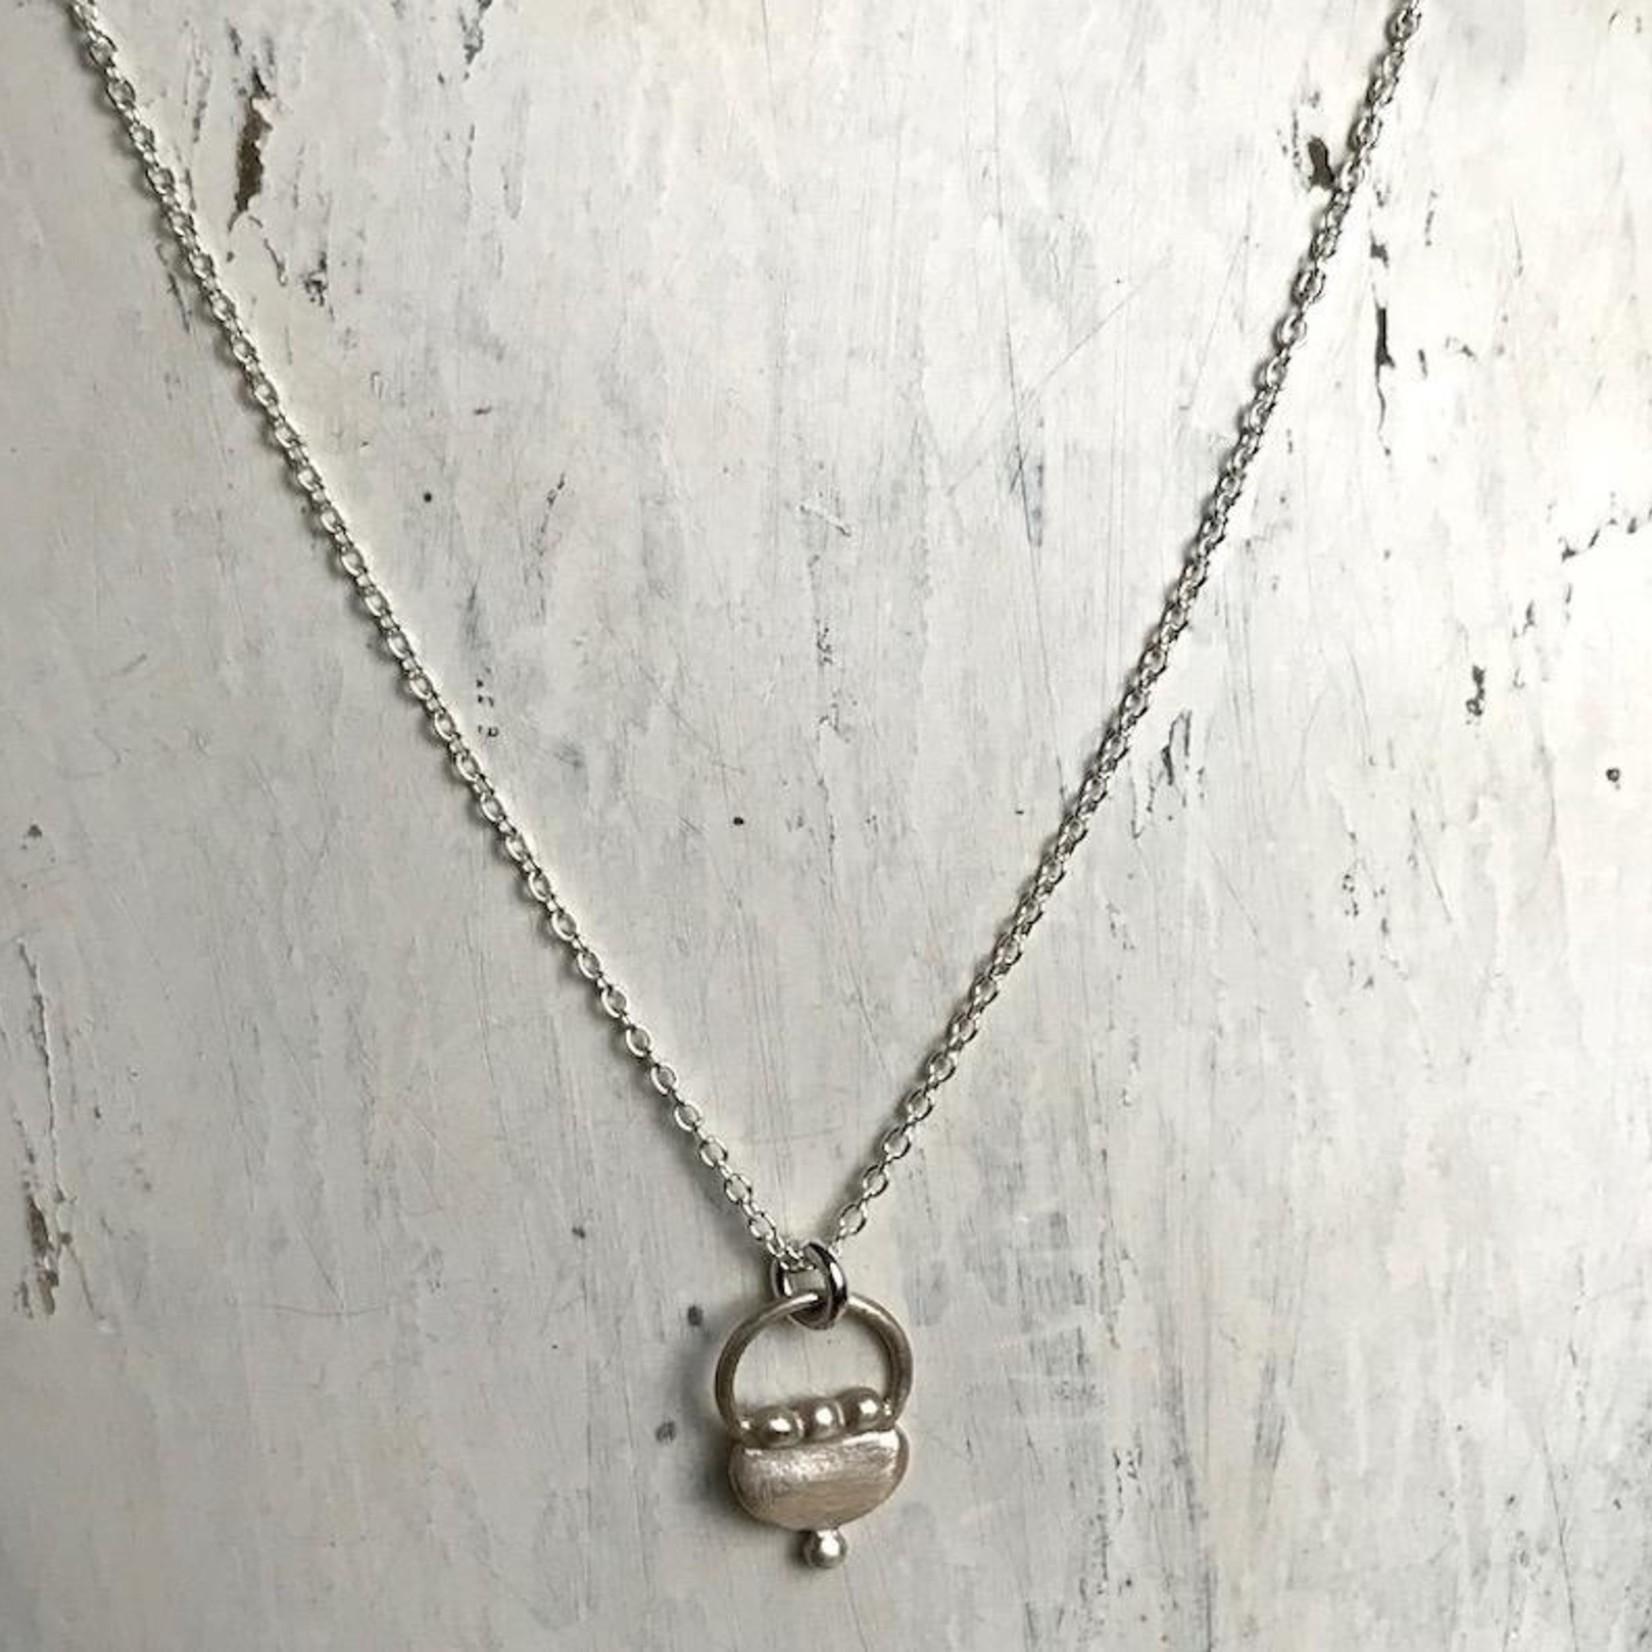 Handmade Silver Tiny Purse Design Necklace